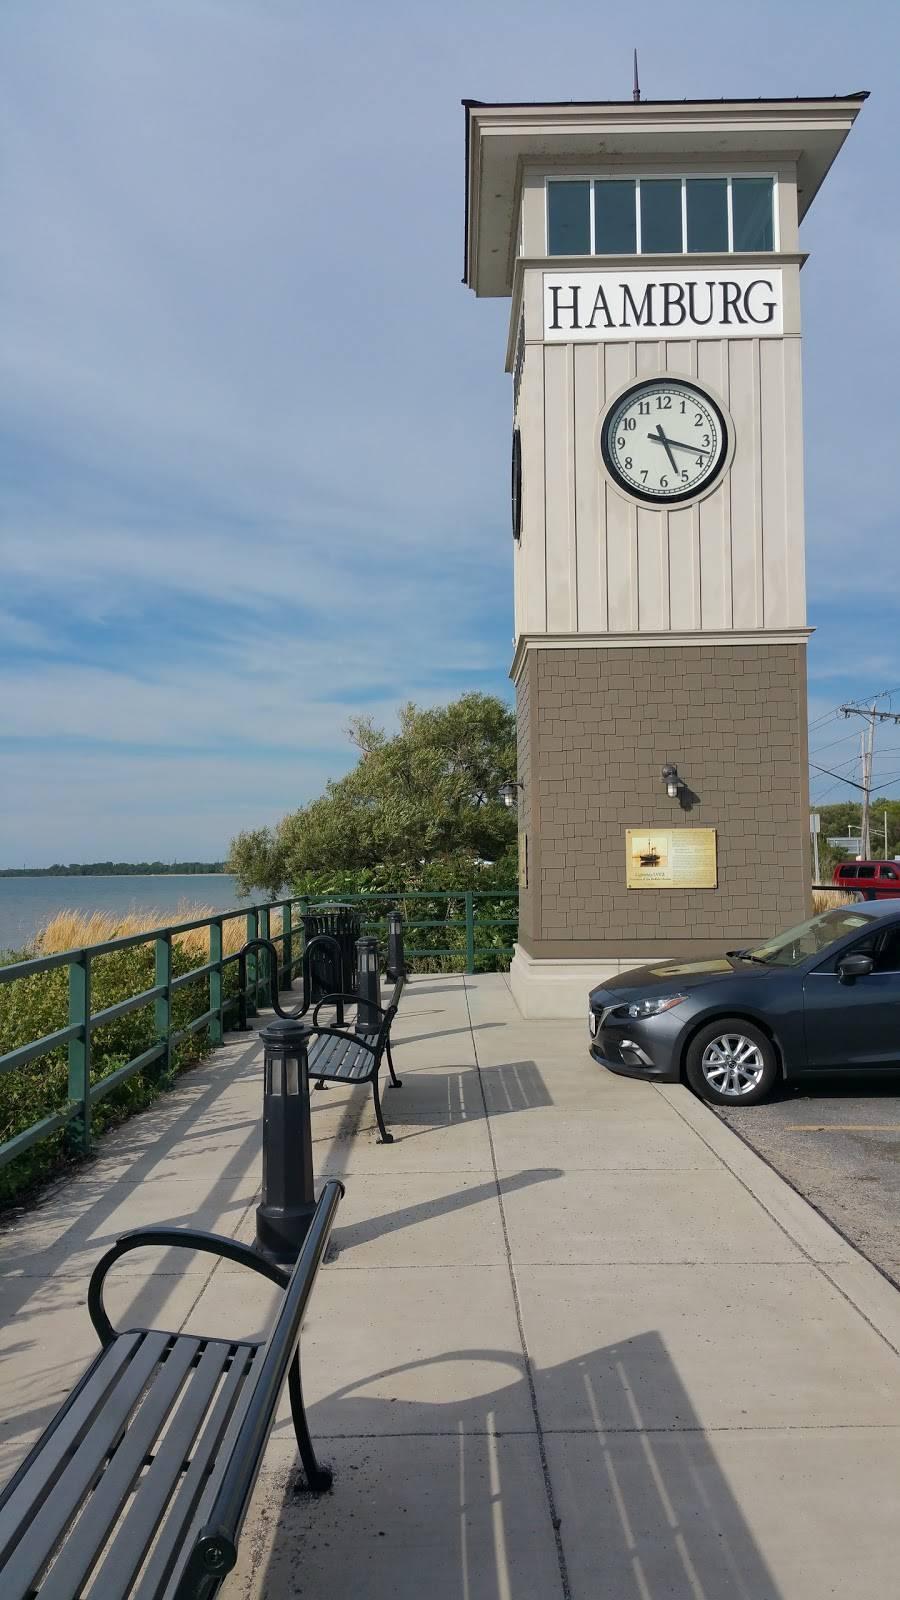 Red Top Hot Dogs - restaurant  | Photo 7 of 9 | Address: 3360 Big Tree Rd, Hamburg, NY 14075, USA | Phone: (716) 627-5163